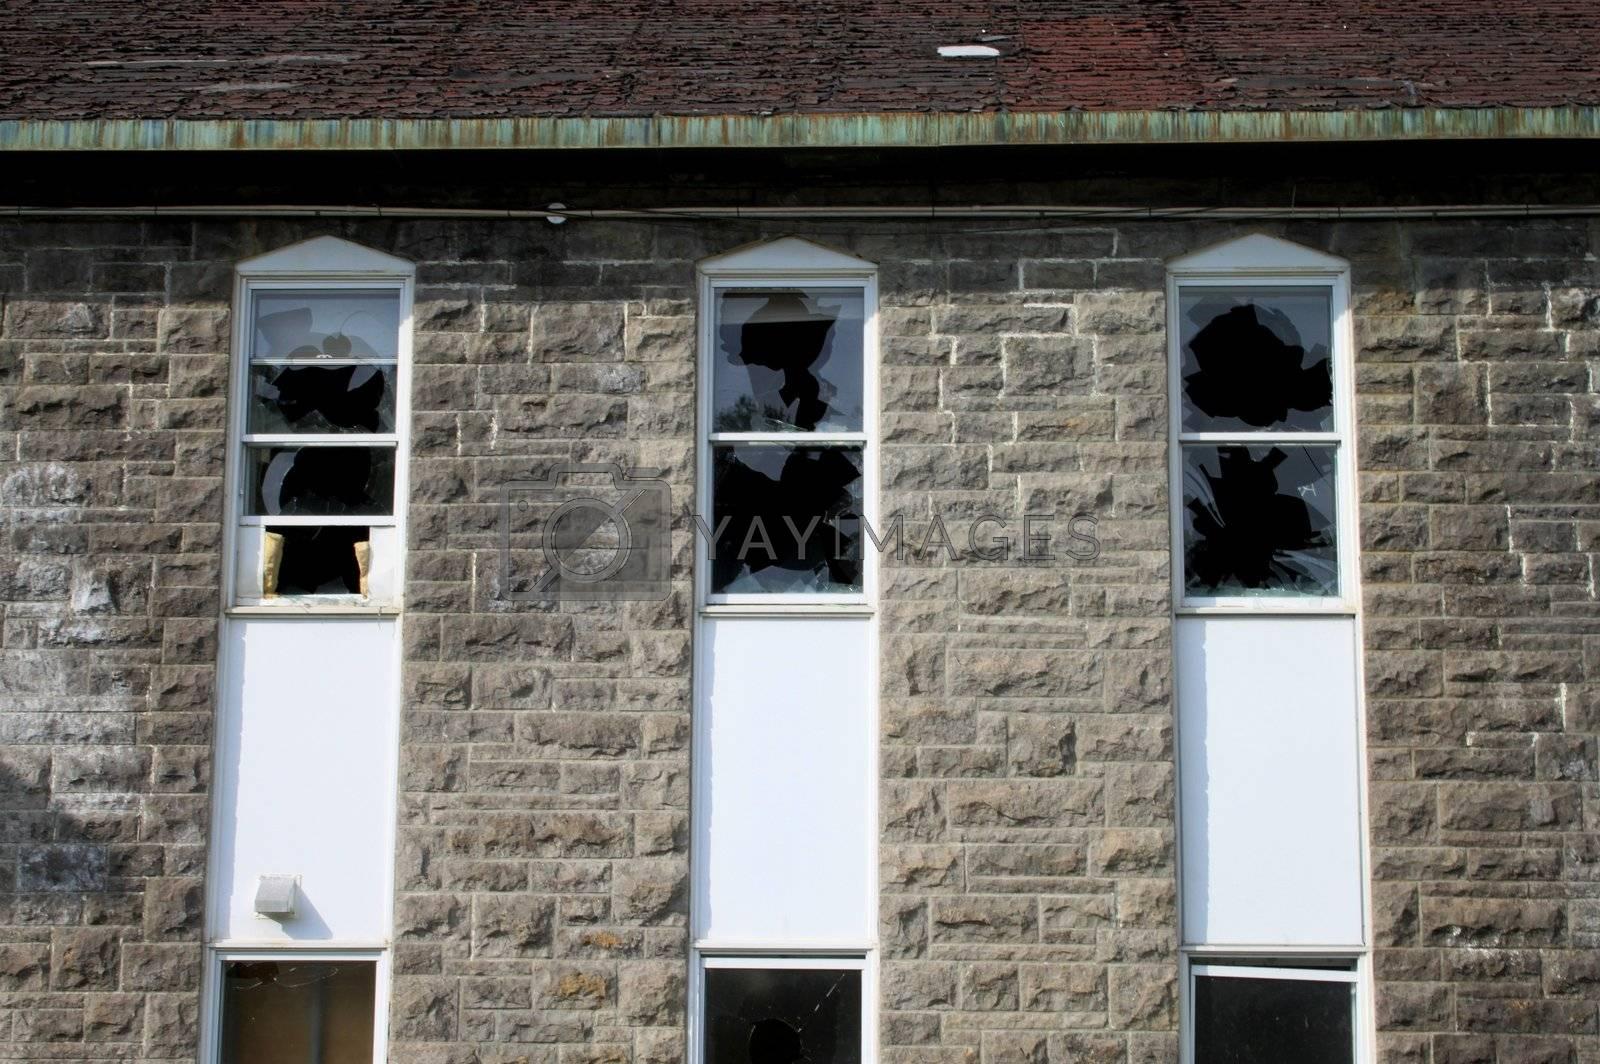 Broken windows by vandalism on historic building